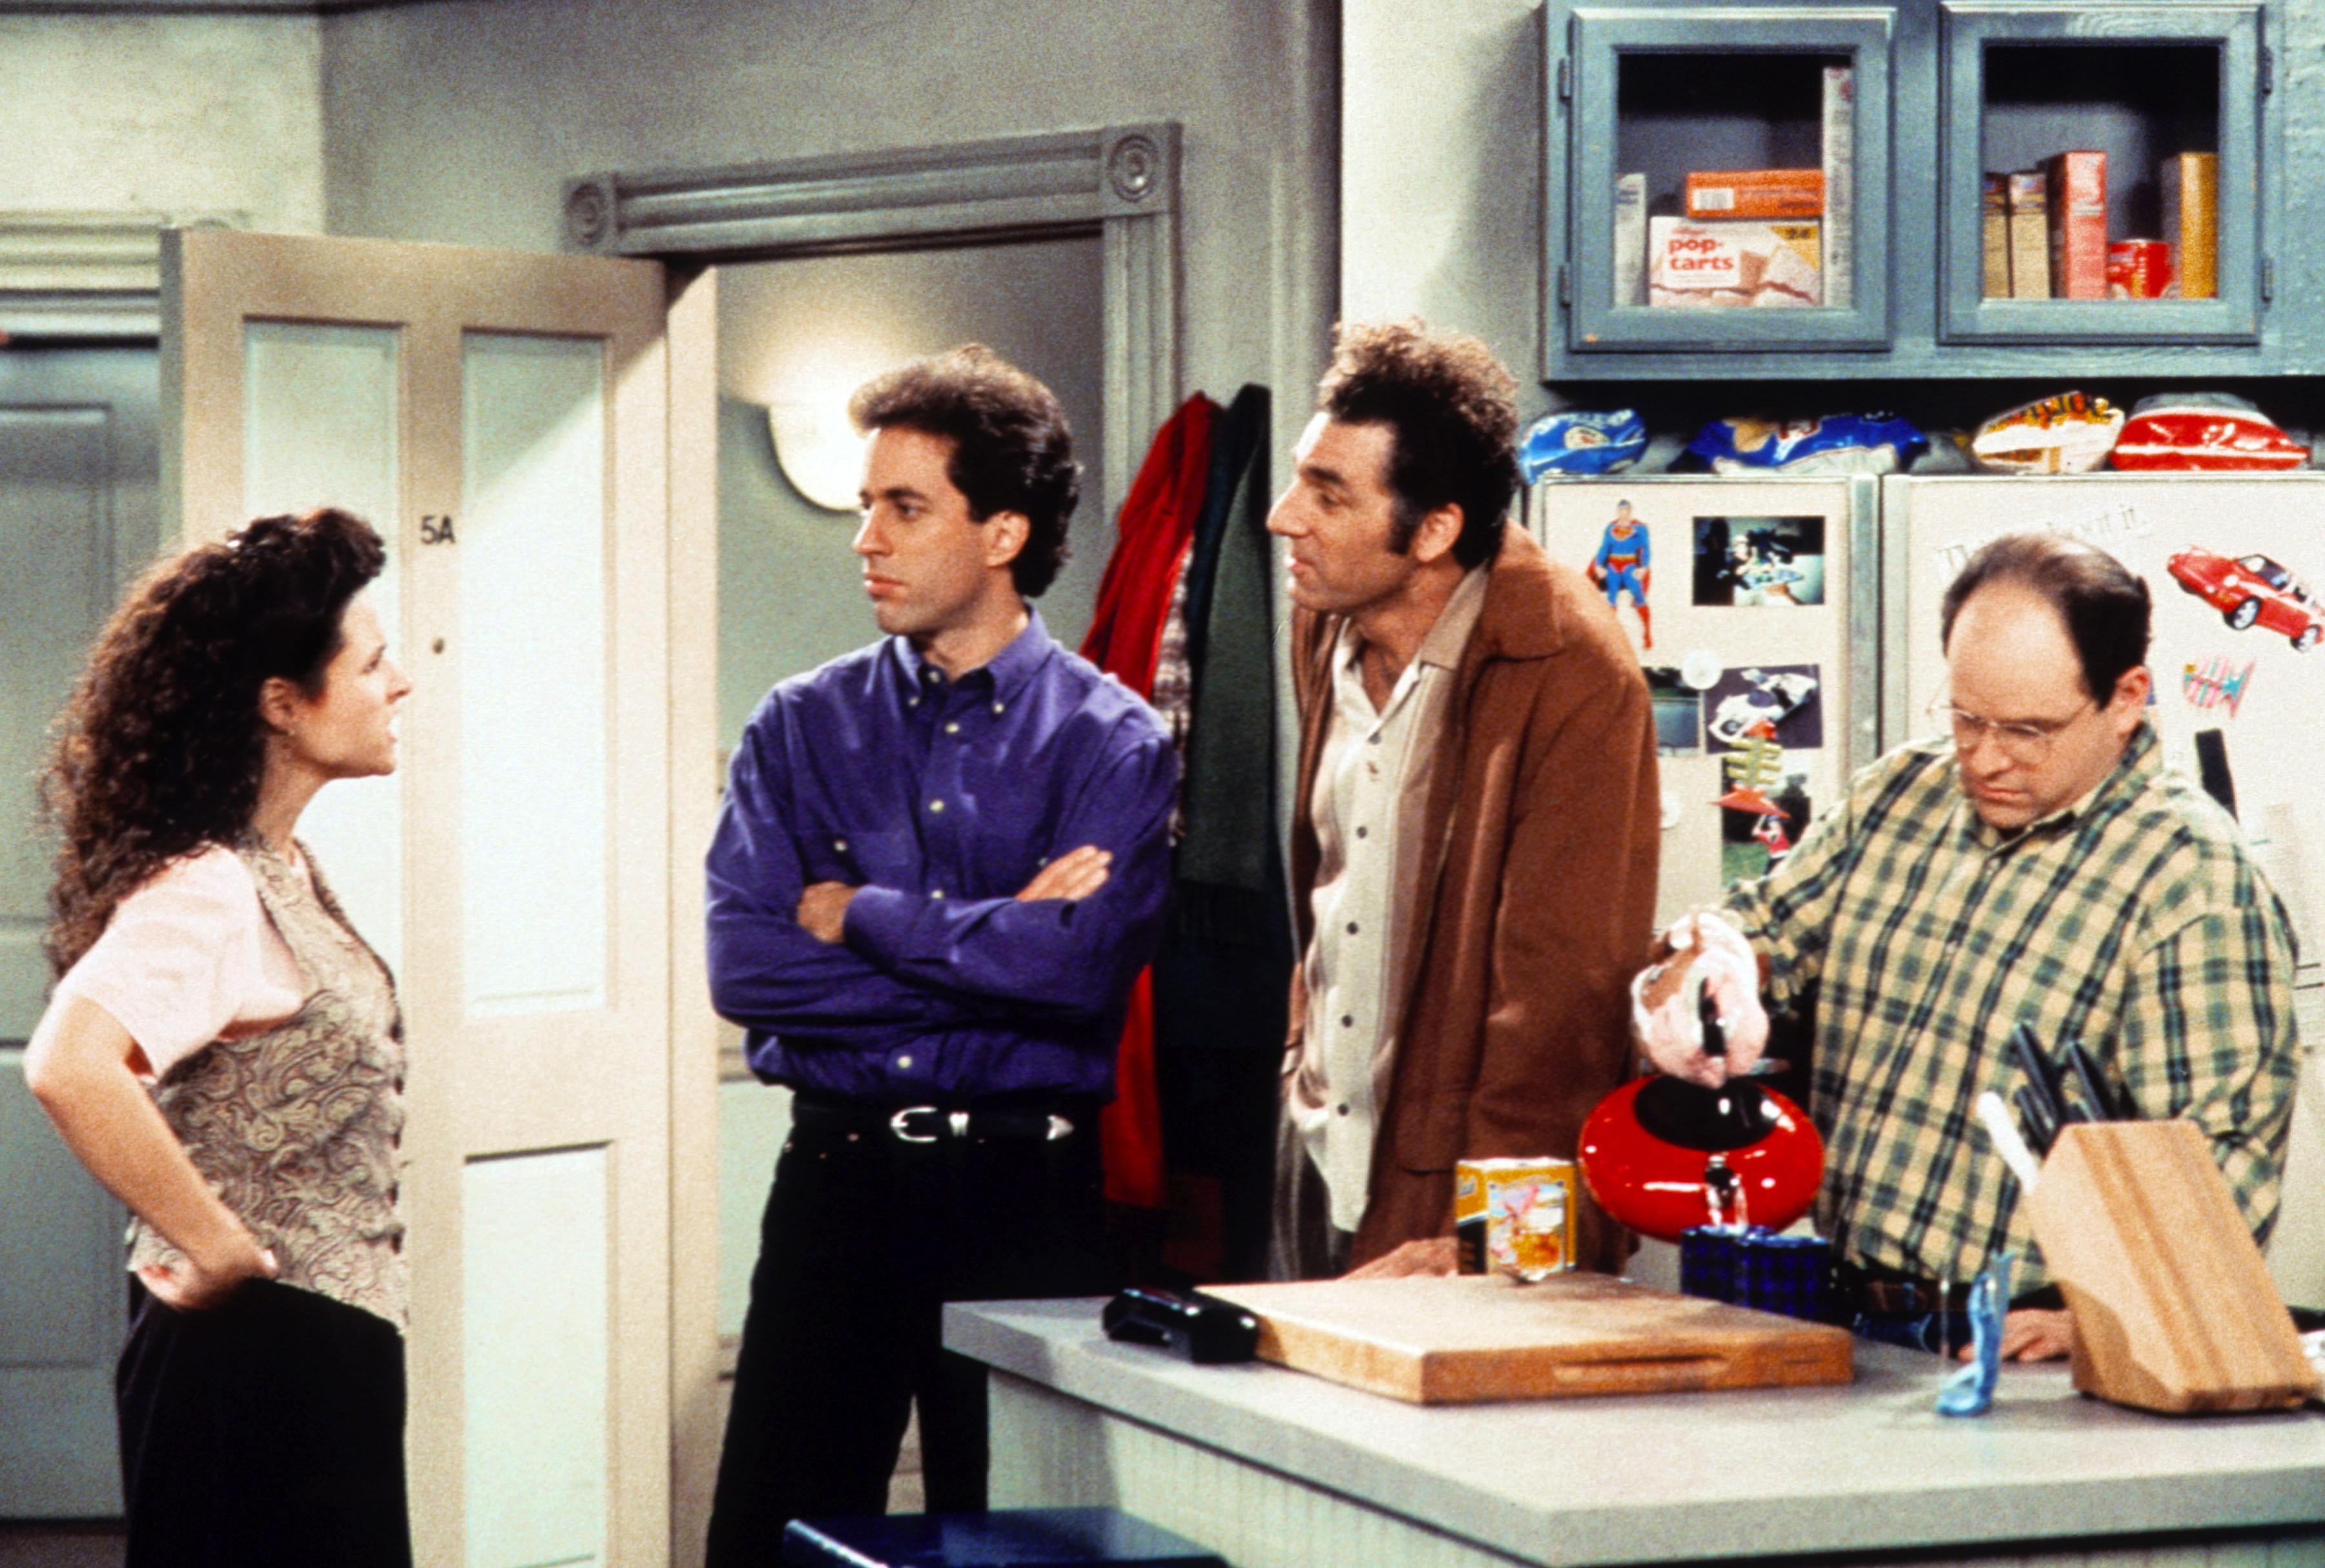 Happy National Pretzel Day, Seinfeld fans!